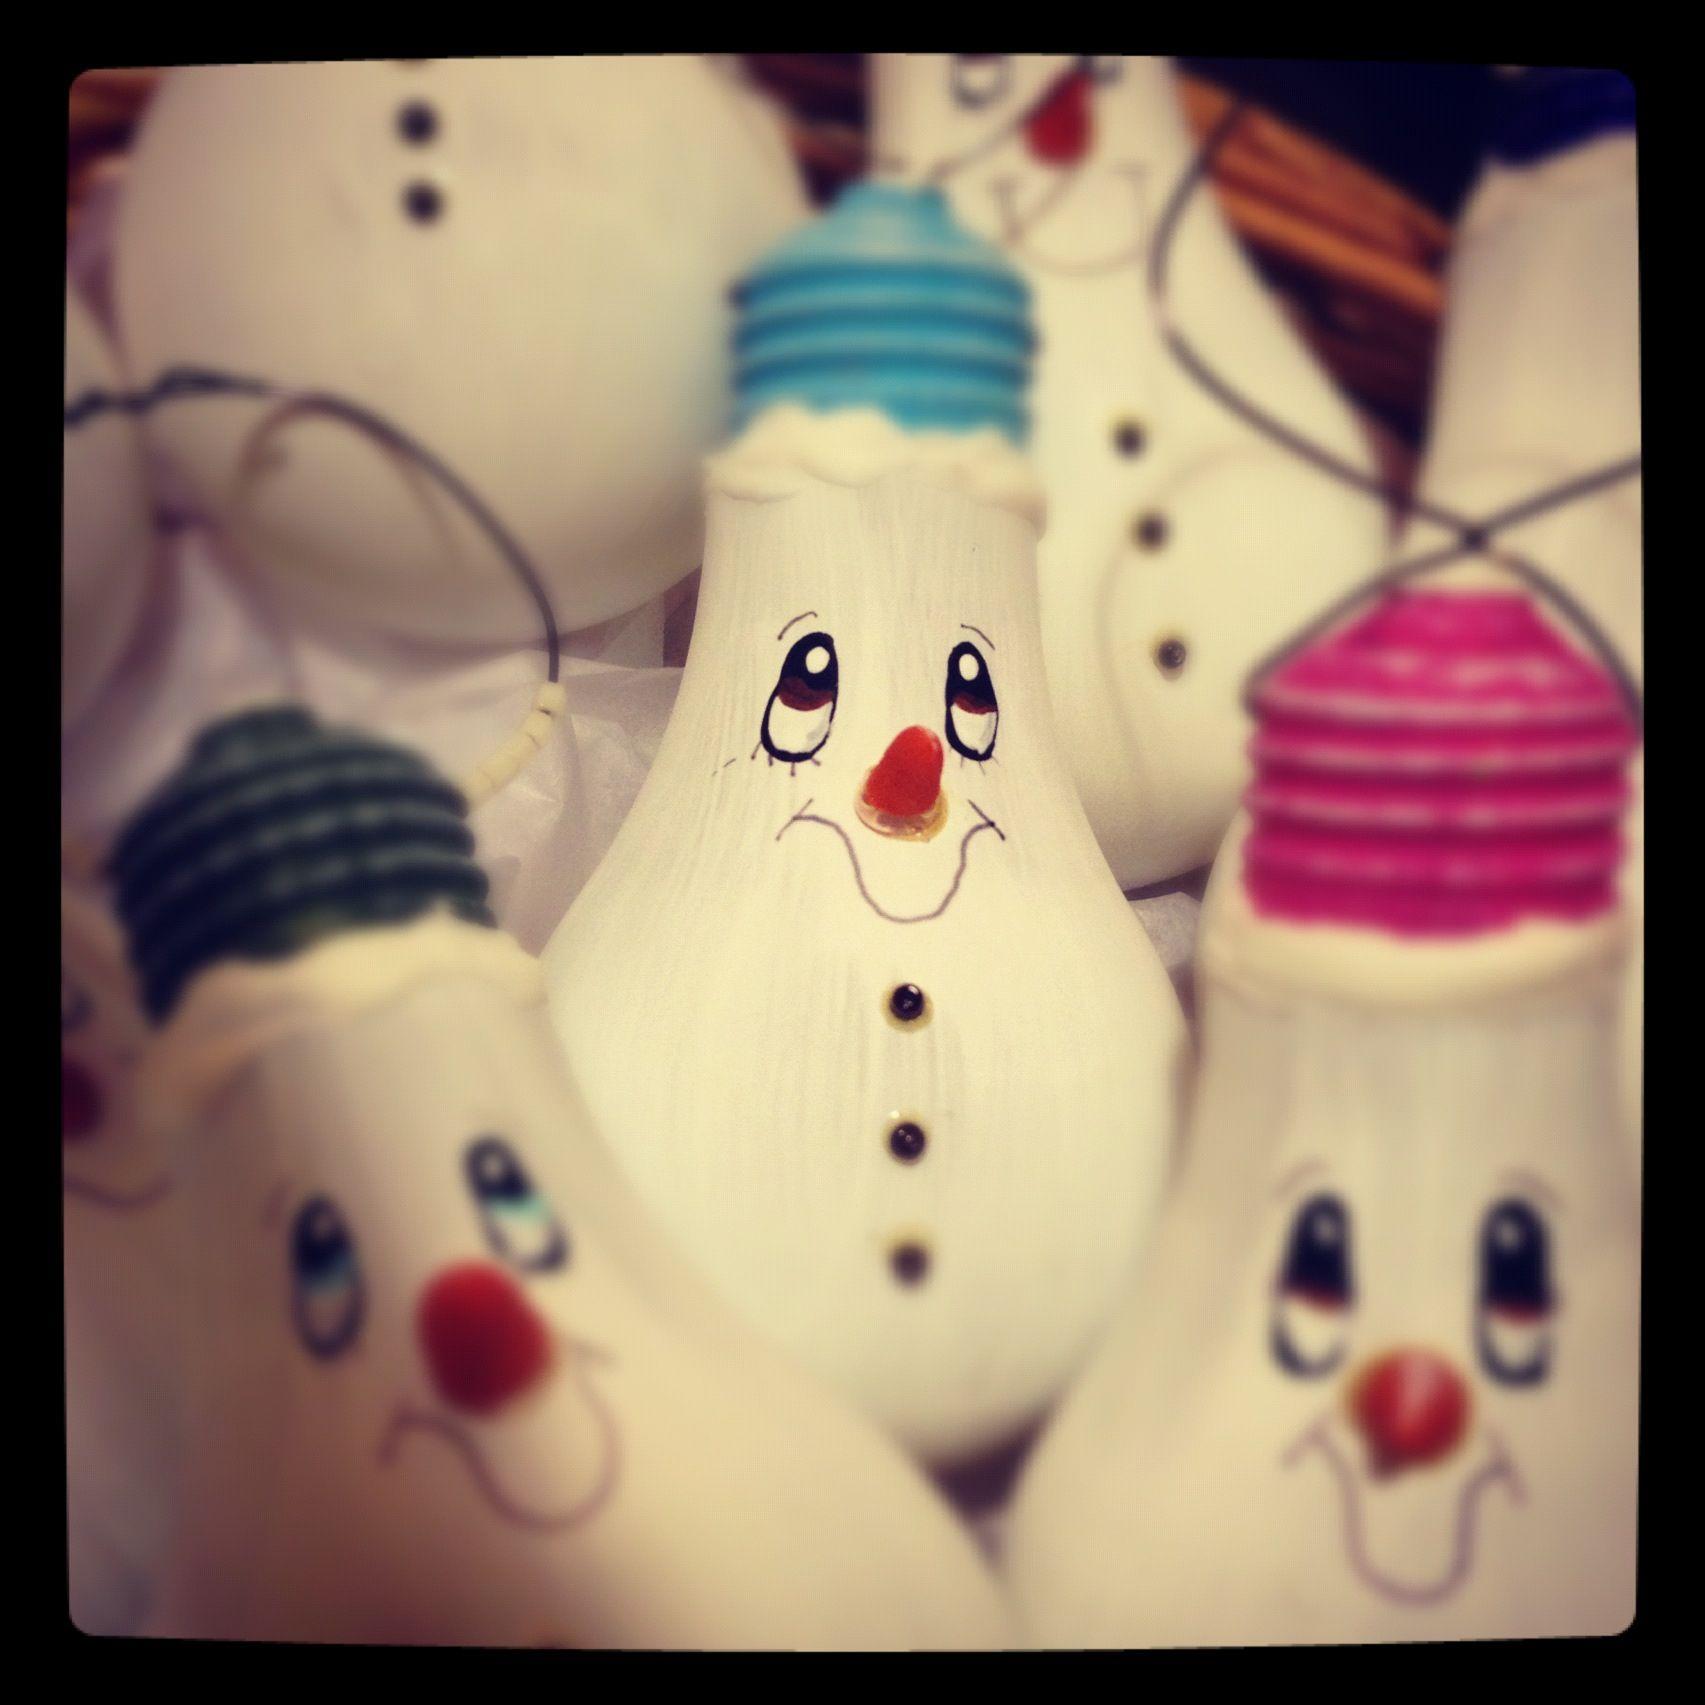 Lightbulb Ornaments Light Bulb Ornaments Christmas Ornaments To Make Light Bulb Crafts